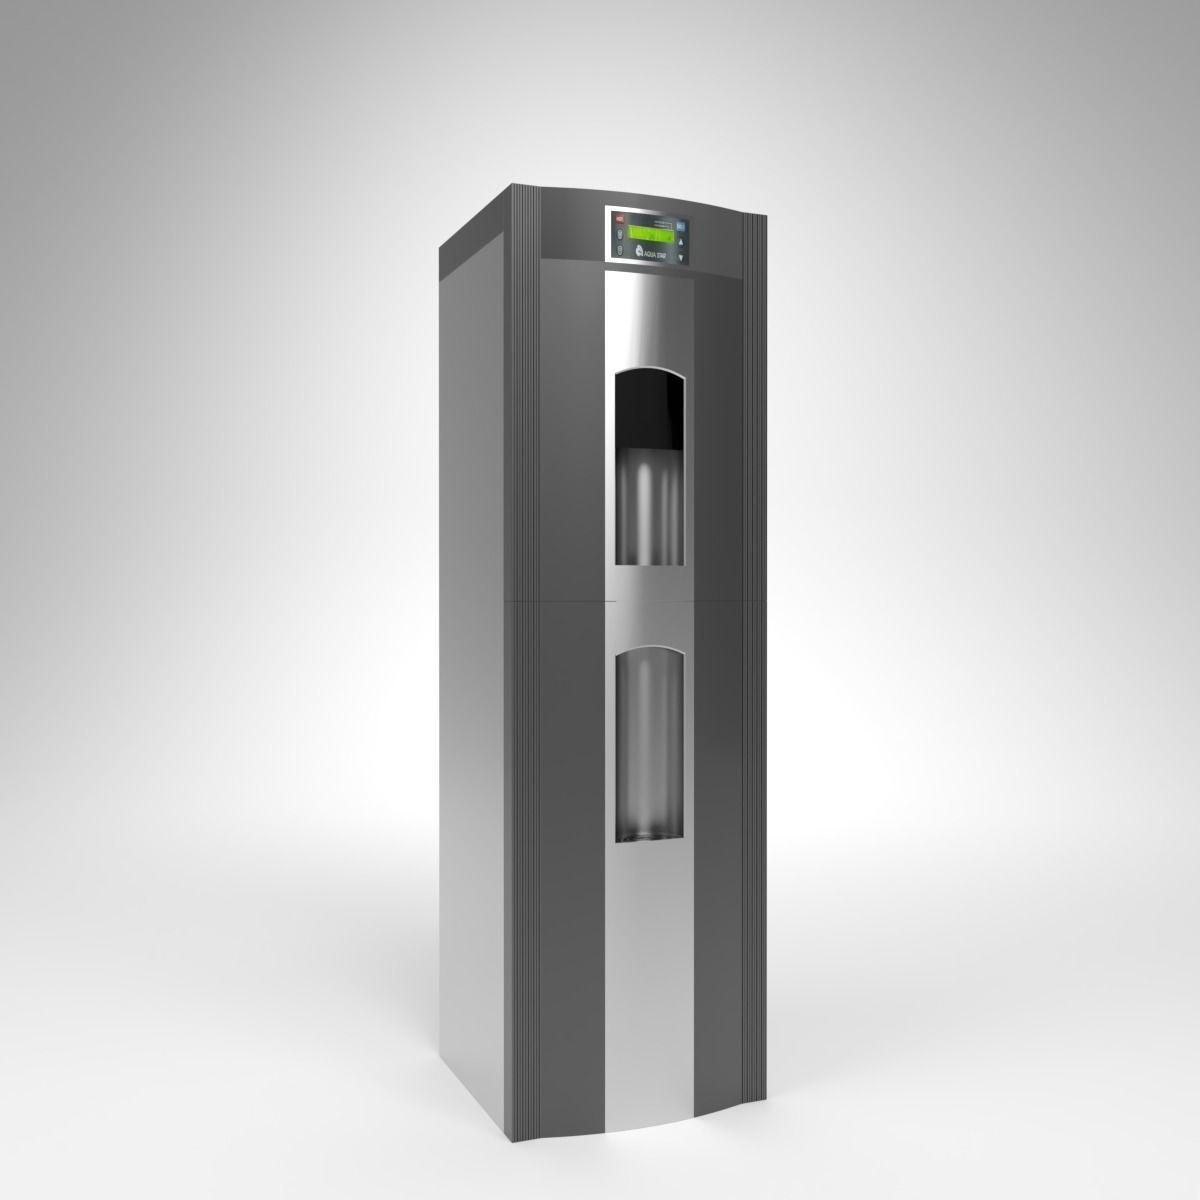 AQUA STAR water cooler WP-2207 LD Blender Cycles